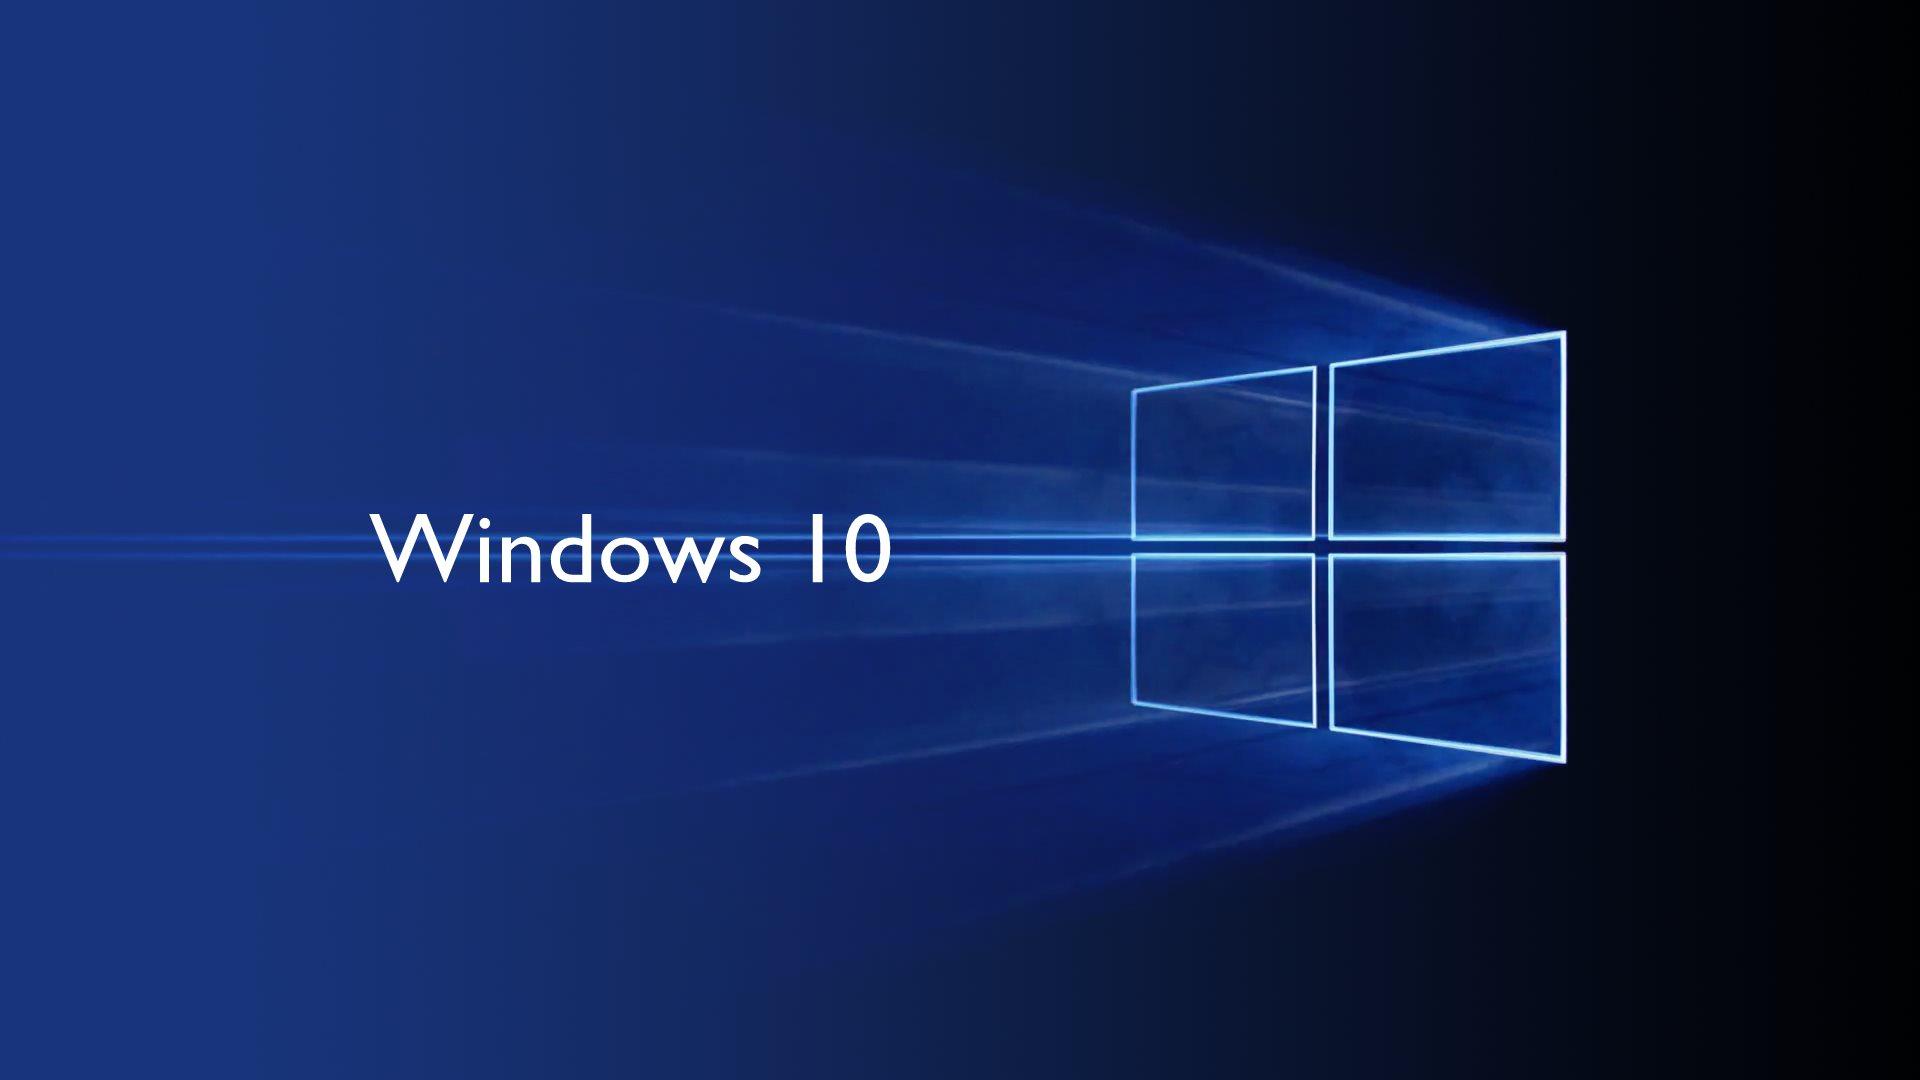 Aosder W823; Windows 10 blue wallpaper